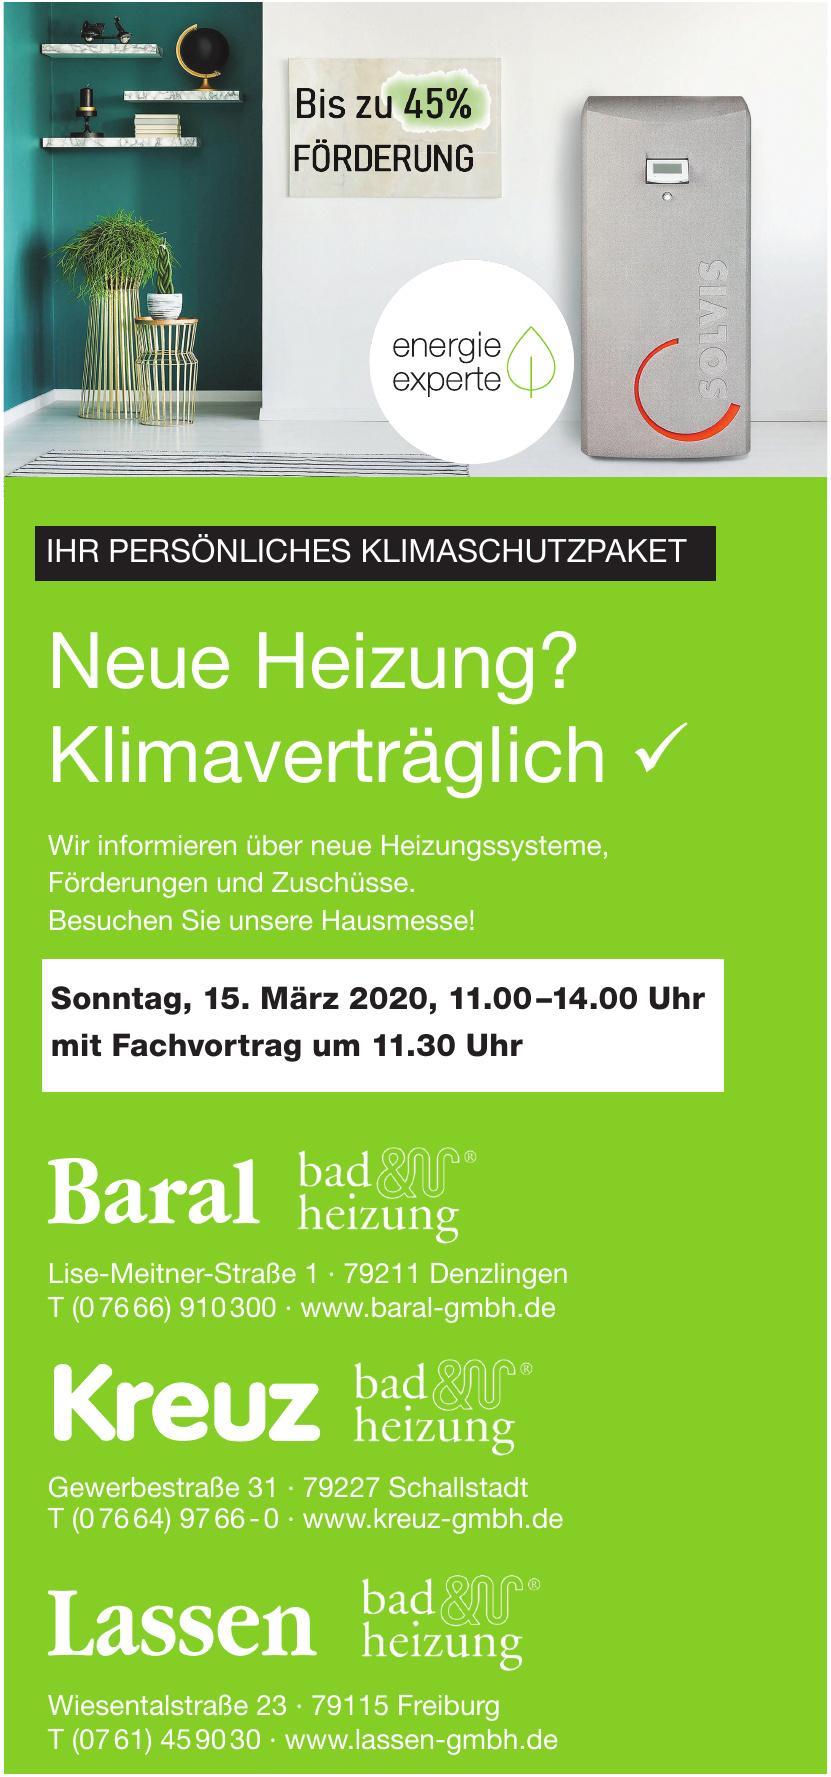 Baral GmbH